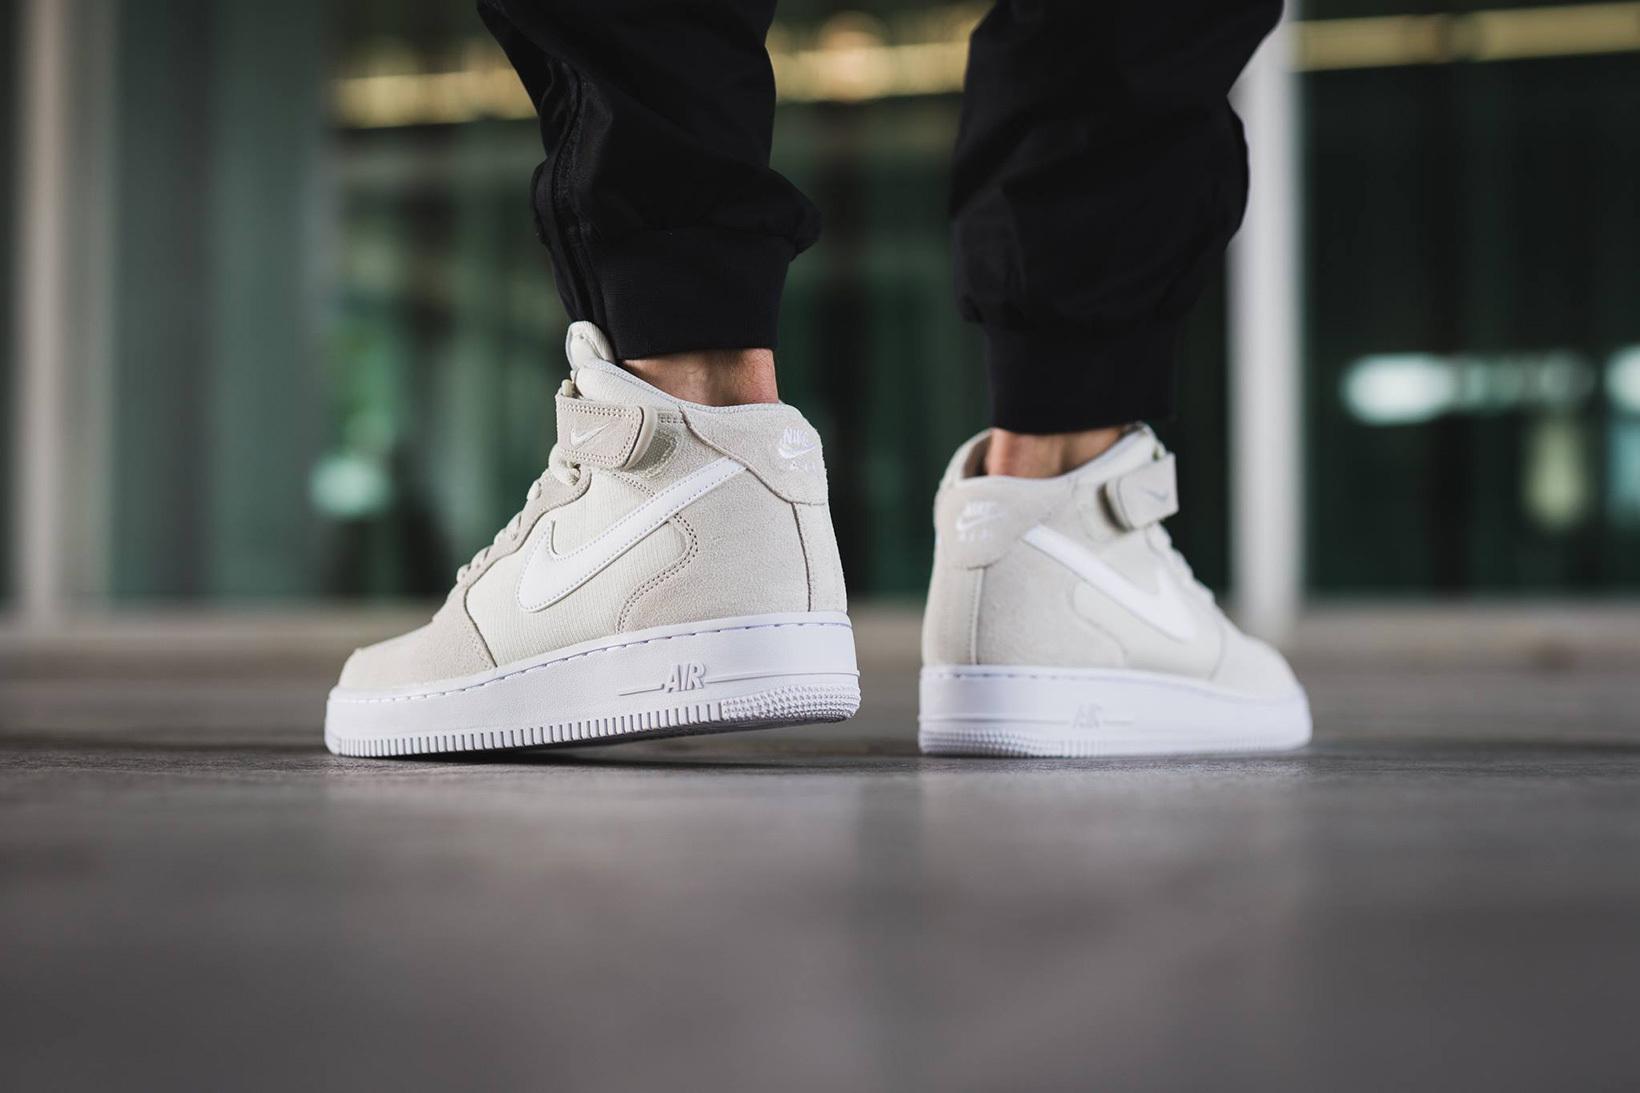 nike-air-force-1-mid-light-bone-sneaker-3